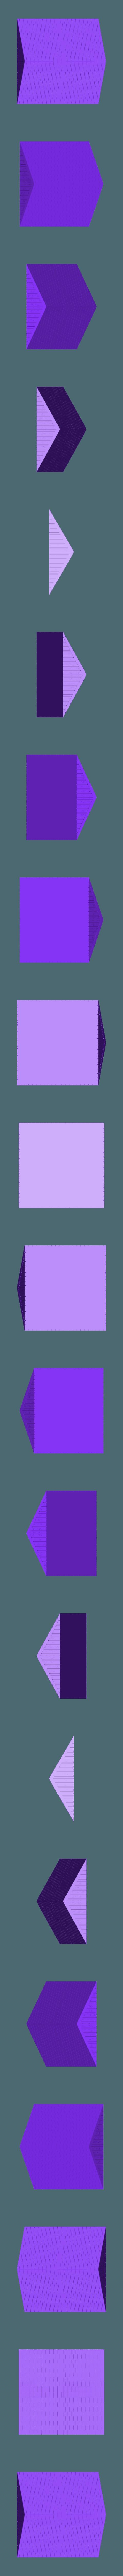 Ecurie toit 28mm.stl Download STL file The Stable - Medieval Wargame at Napoléon • 3D printable design, Eskice